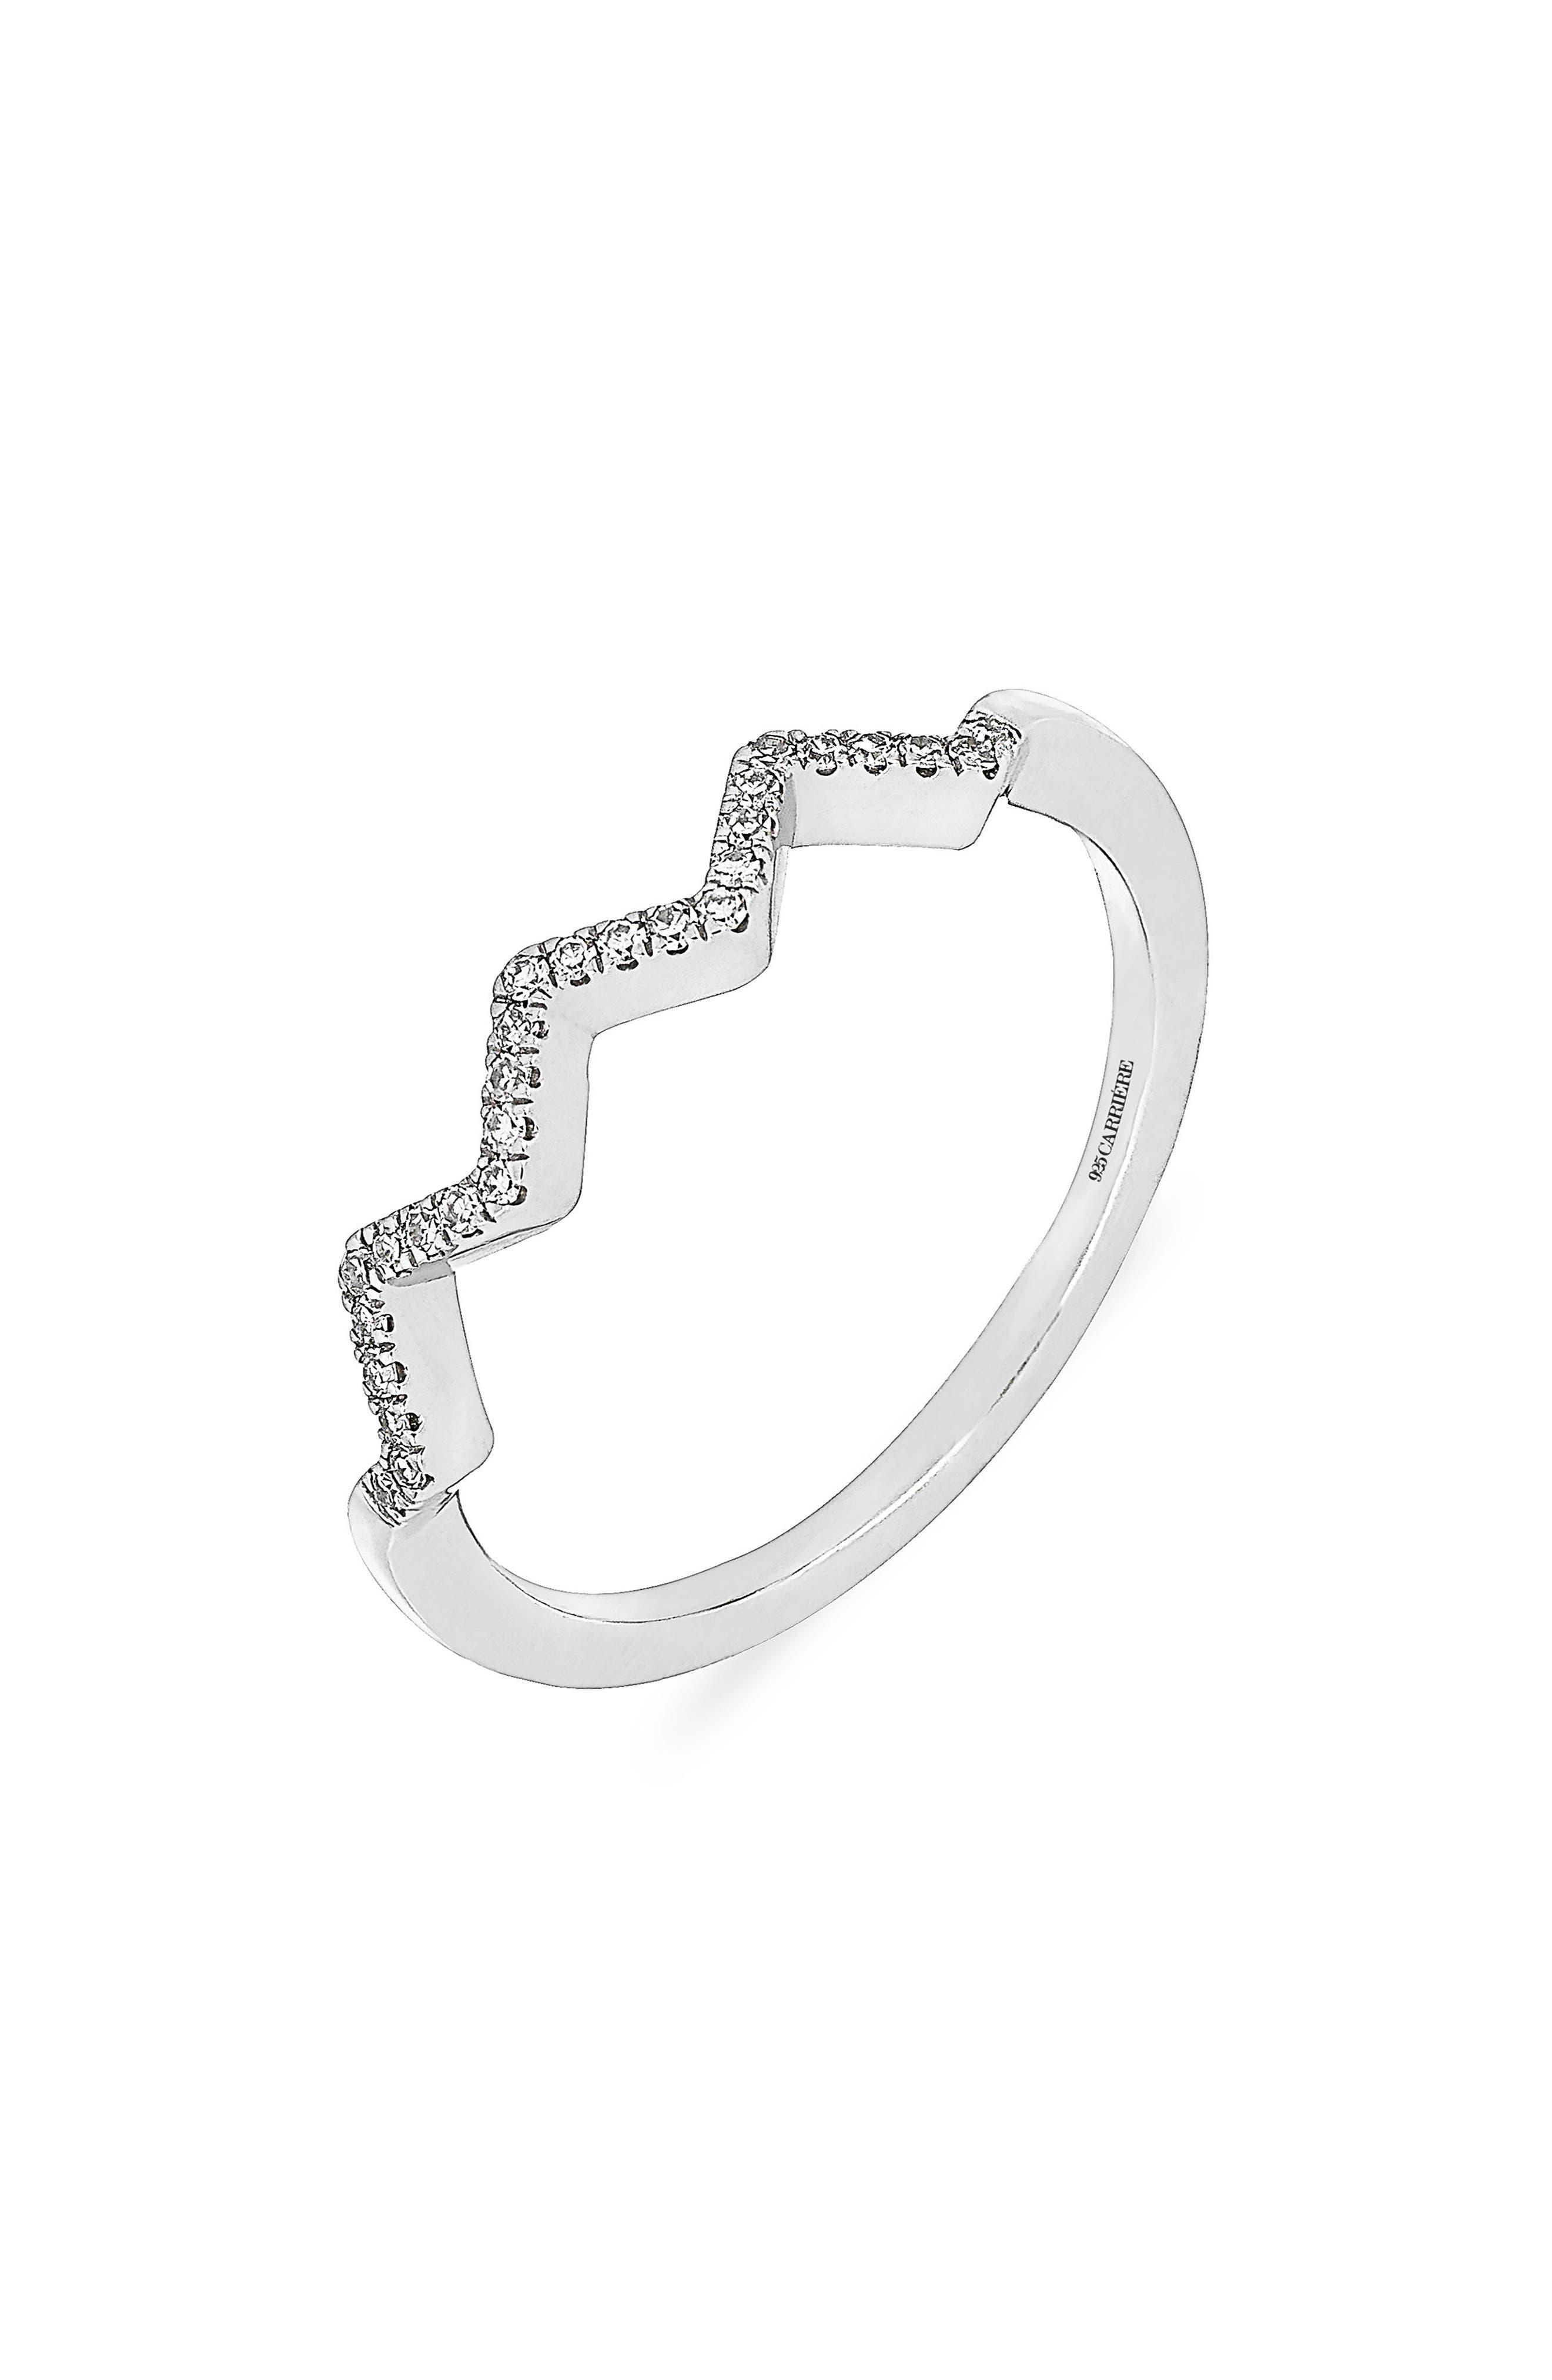 Carrière Zigzag Diamond Ring,                         Main,                         color, 040